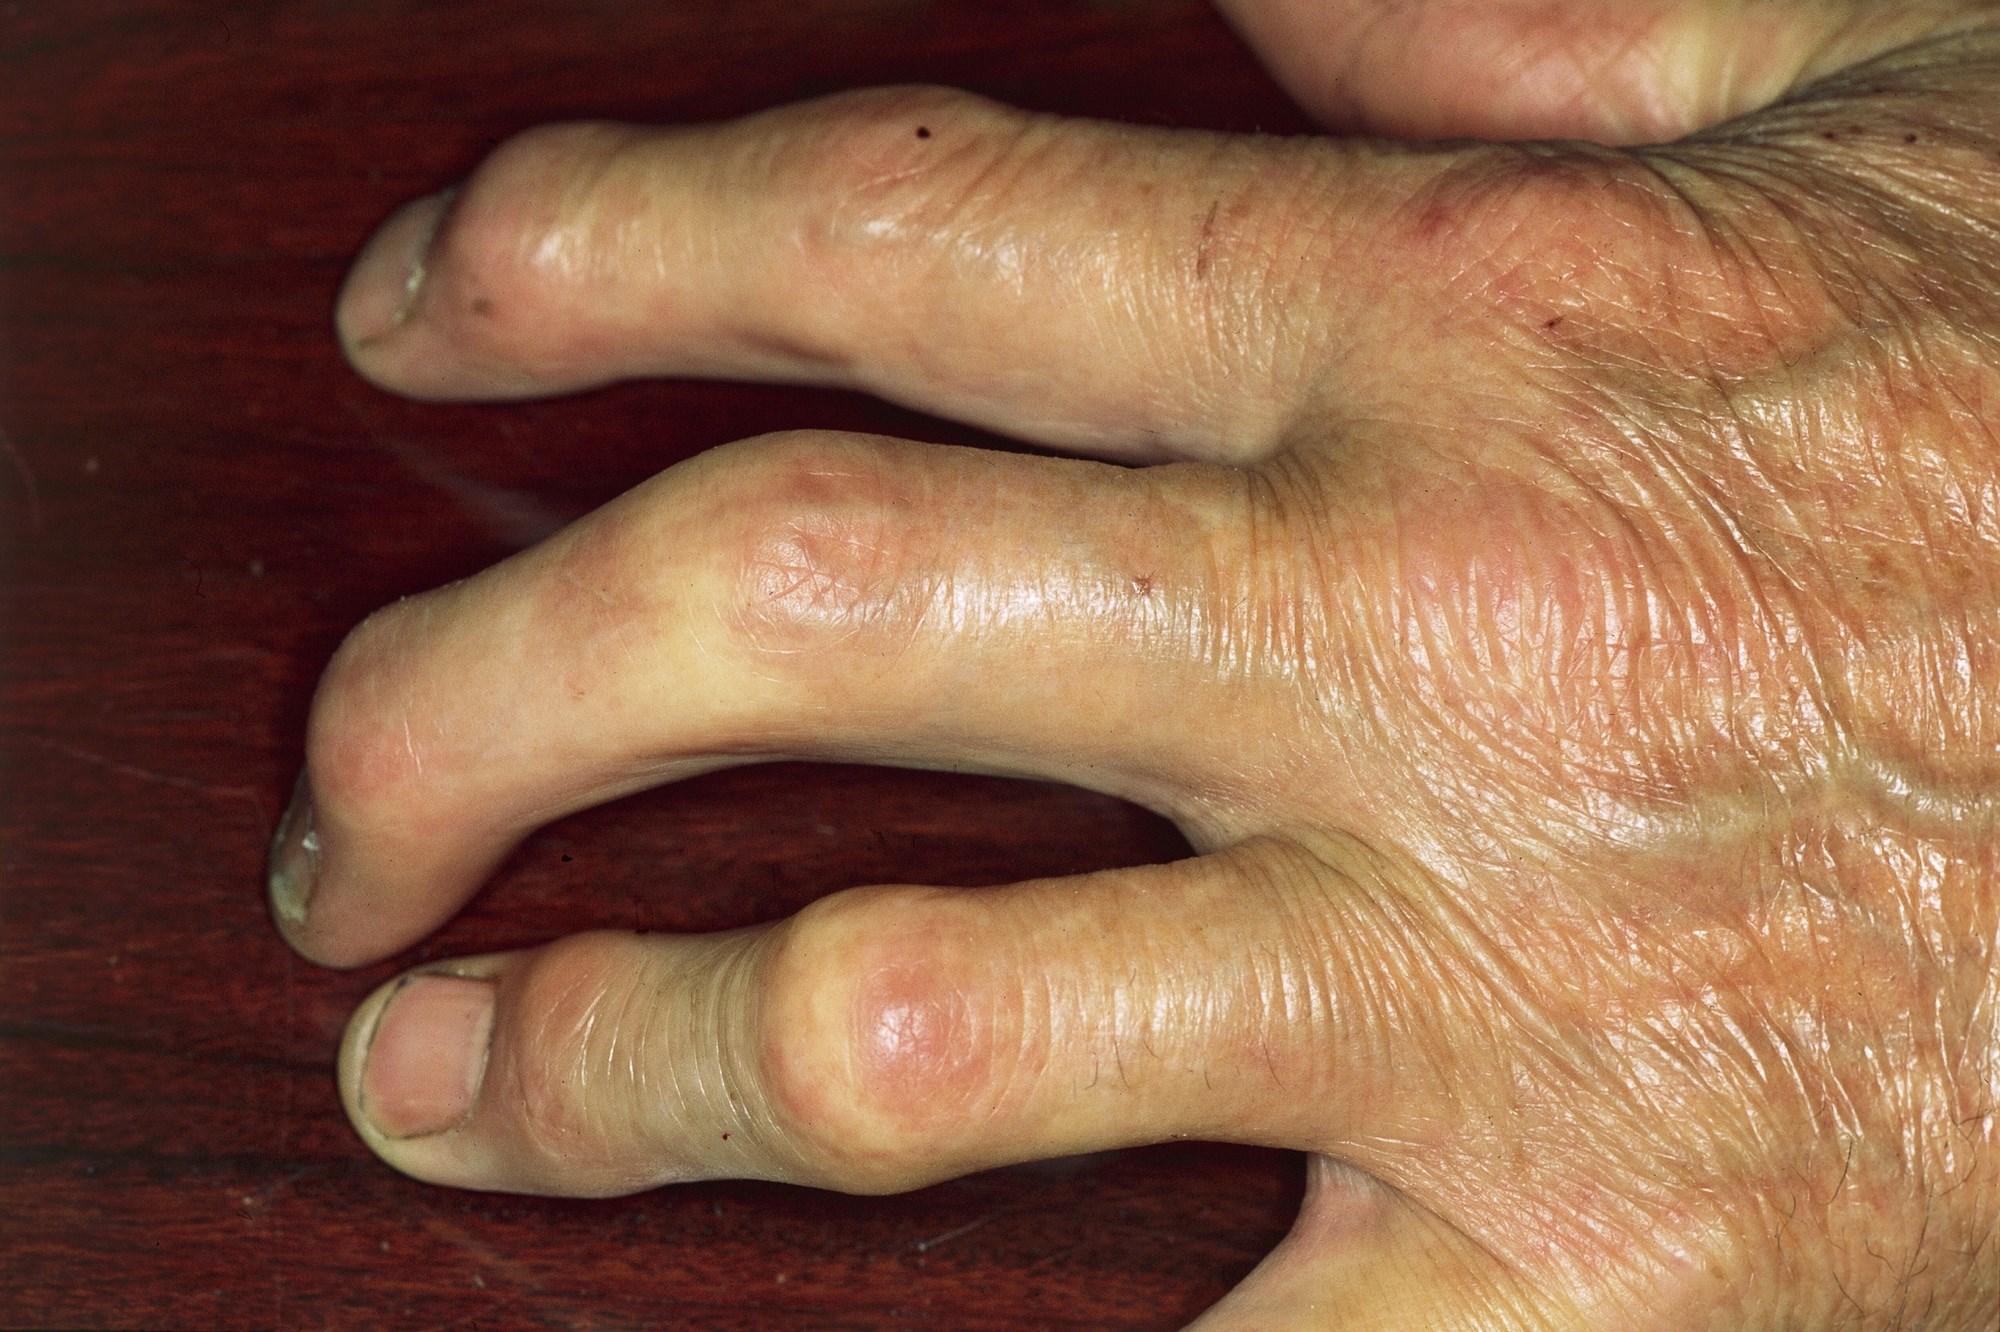 Managing Psoriatic Arthritis: Updated 2018 Recommendations From ACR/NPF